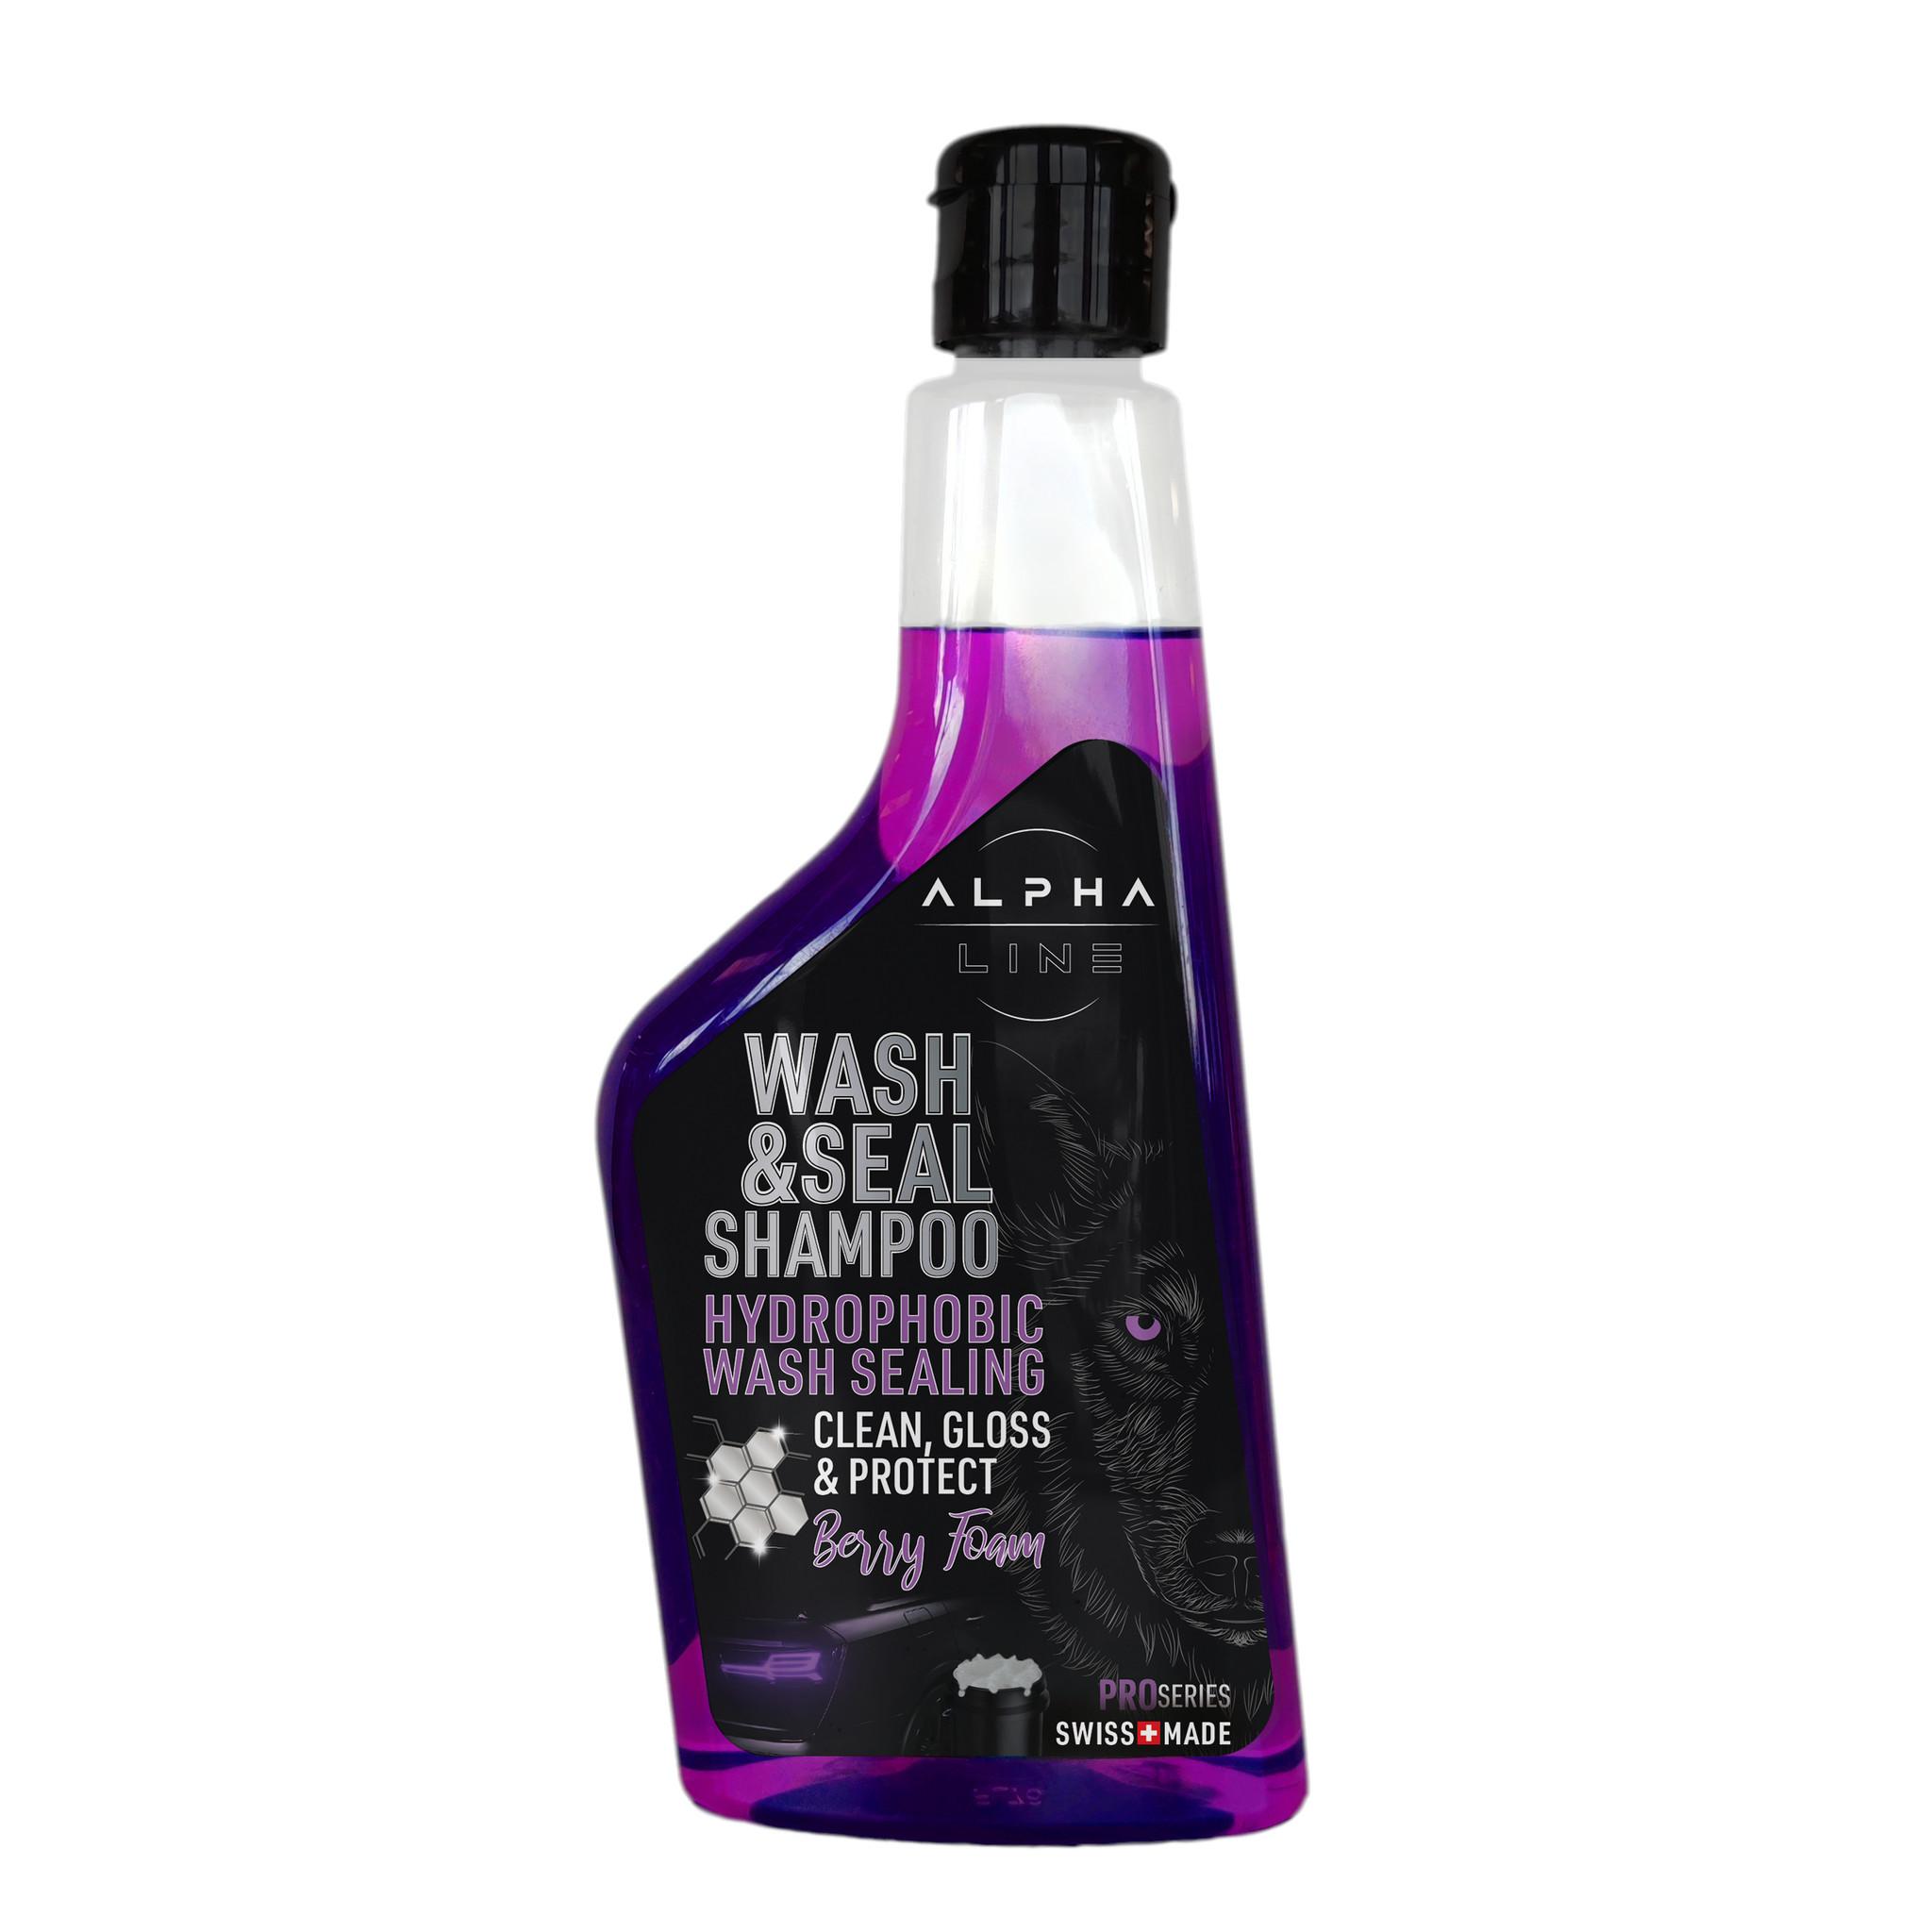 ALPHA LINE ALPHA LINE Wash & Seal Car Shampoo